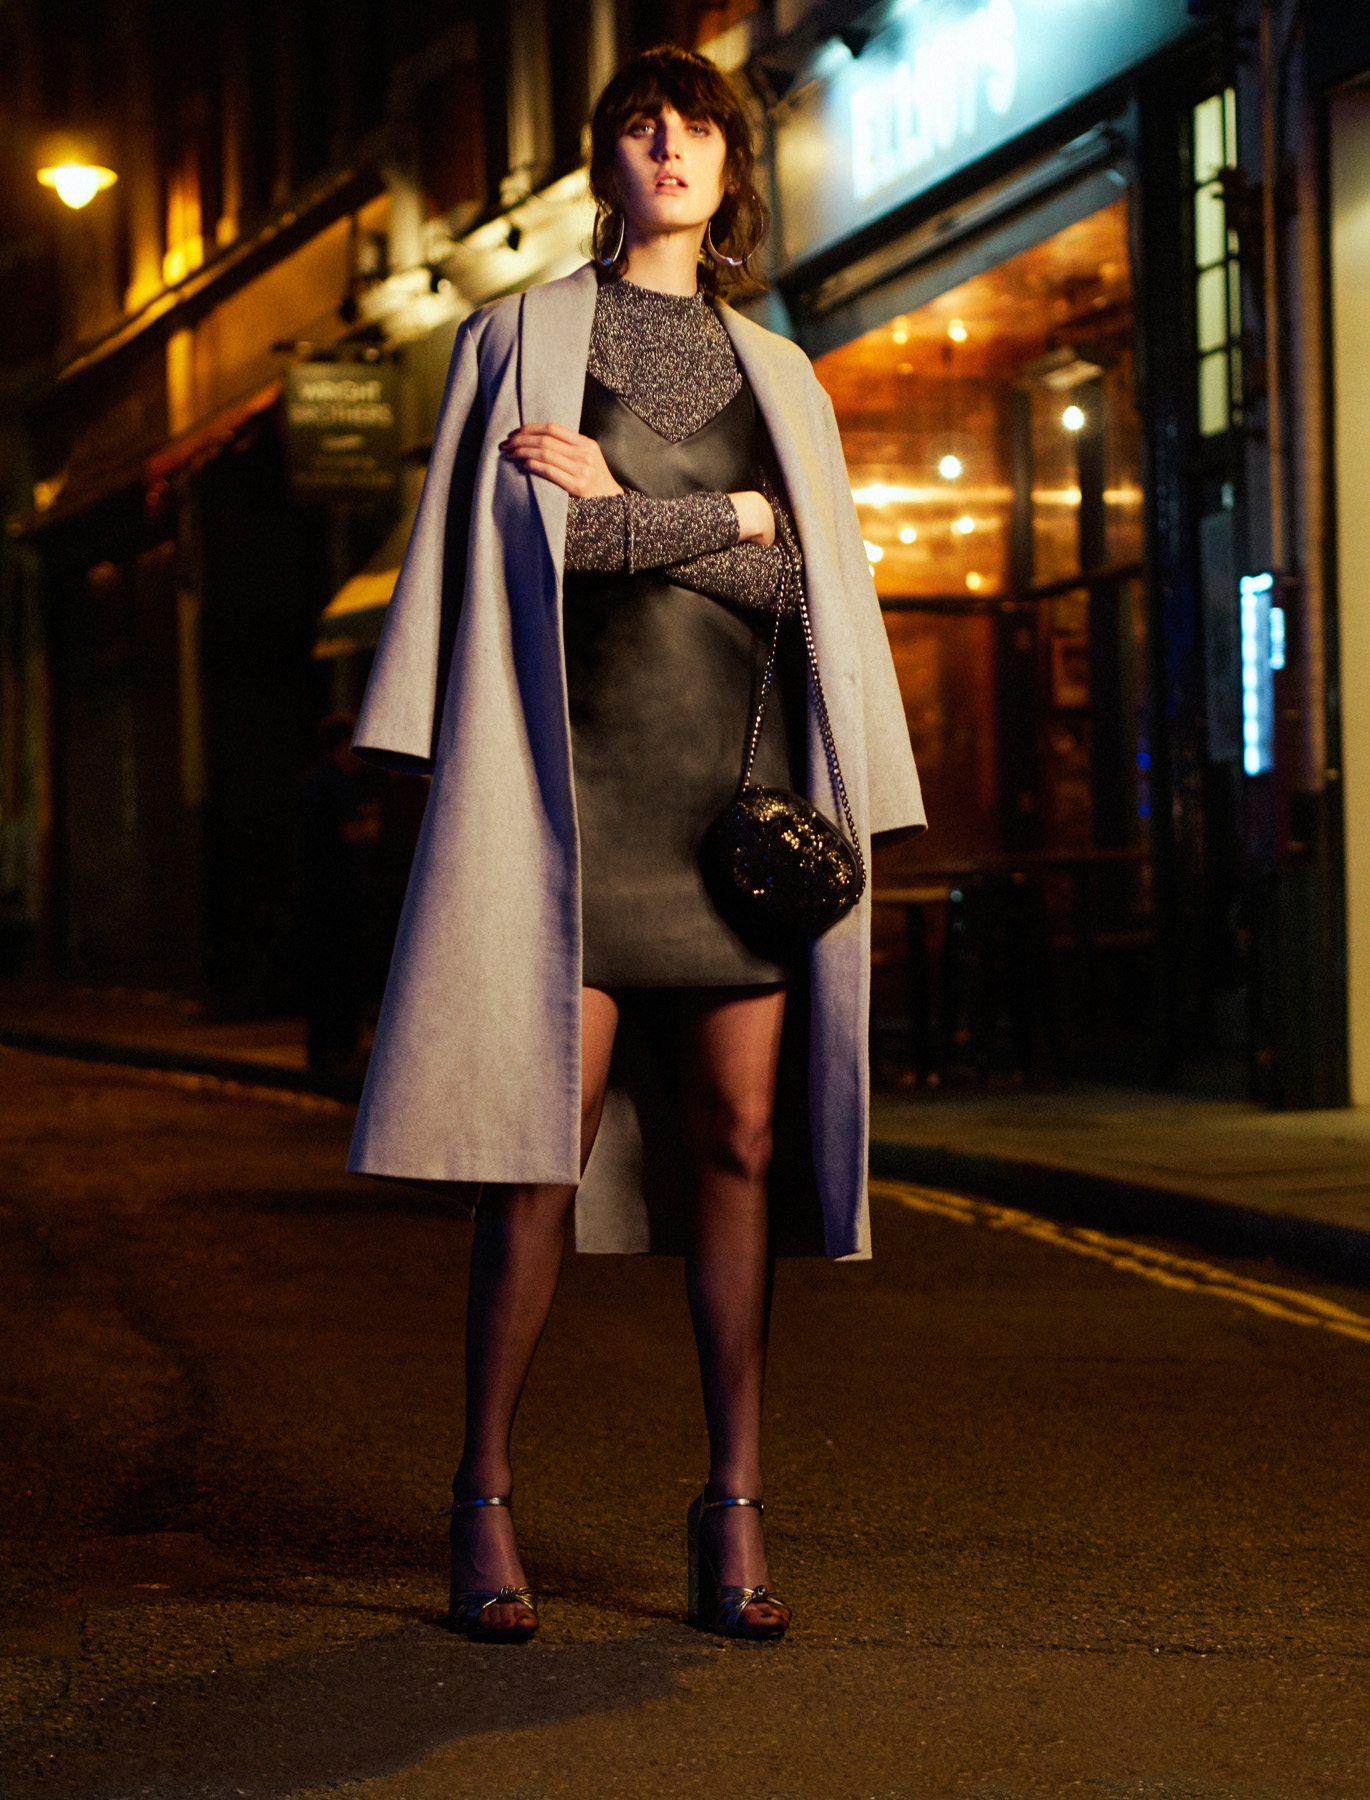 096-icon-artist-management-Kristin-Vicari-Fashion-Glamour x Primark03.jpg